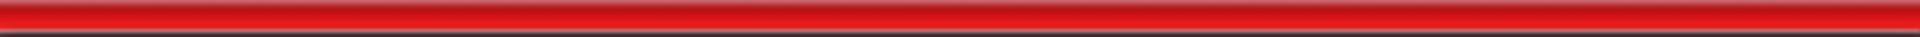 pas-shaul-red-1920-37 FF.jpg